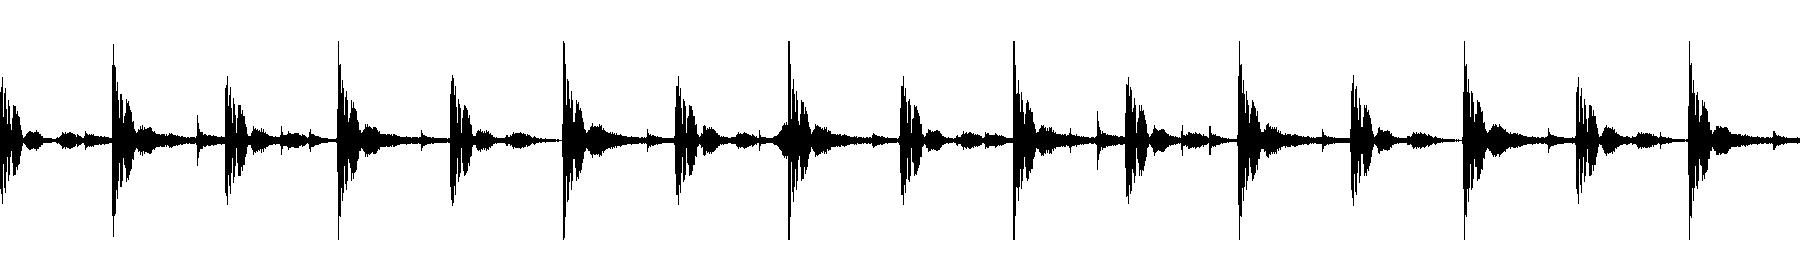 104 drums 04 sp